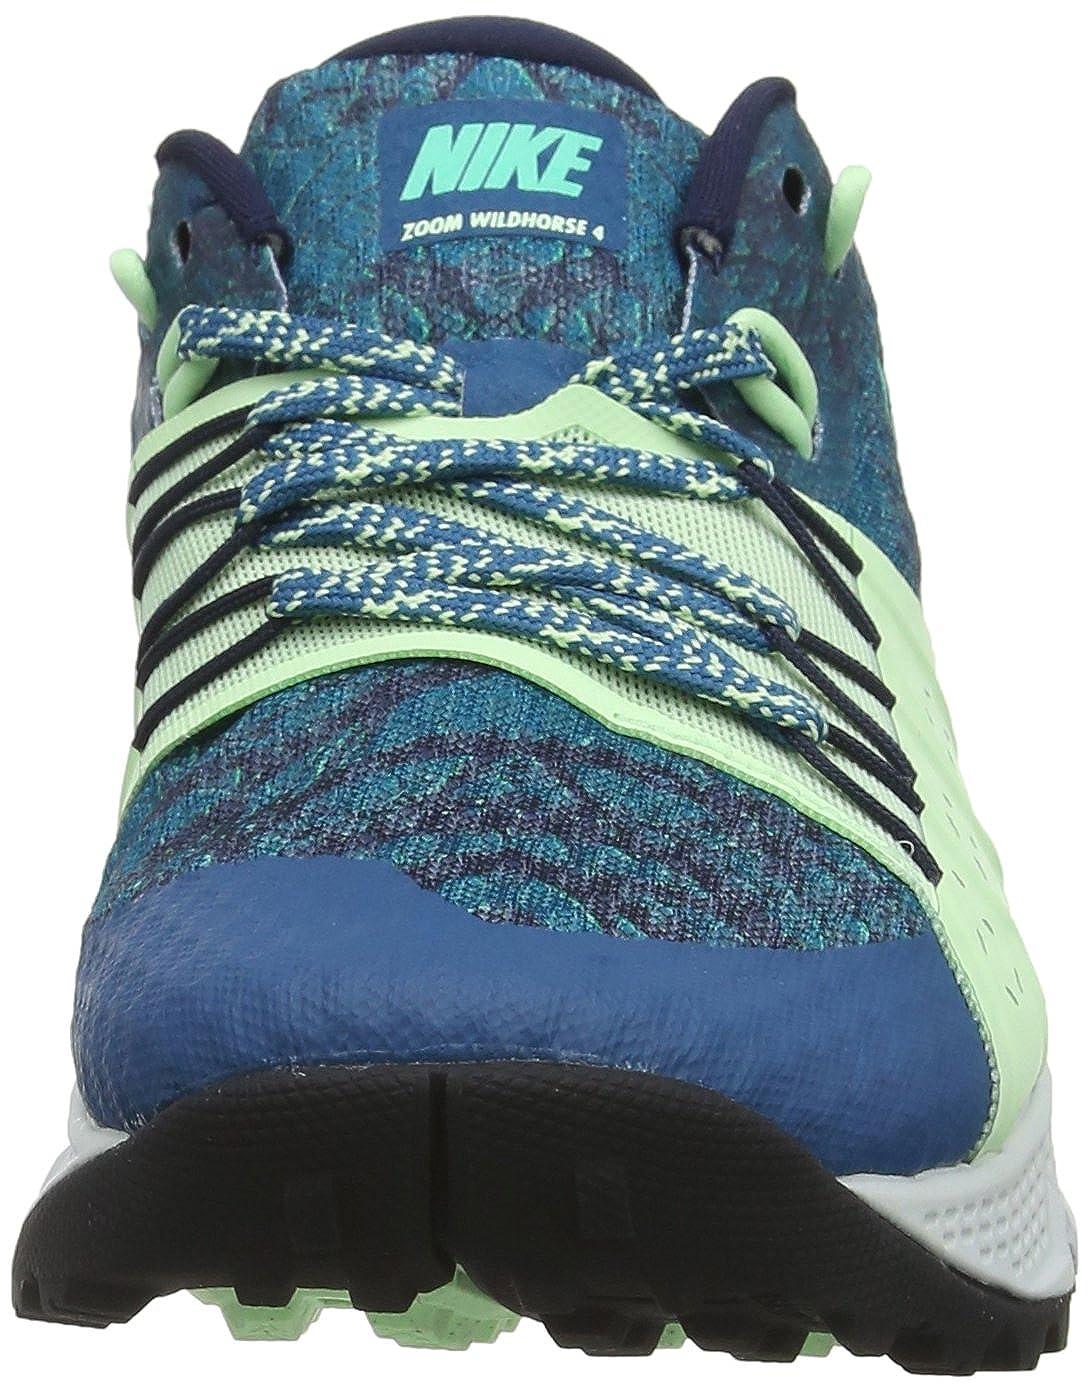 c4739ee198c2 Nike Women s Air Zoom Wildhorse 4 Running Shoe Green Abyss Menta-Obsidian-Vapor  Green 9.0  Amazon.in  Shoes   Handbags